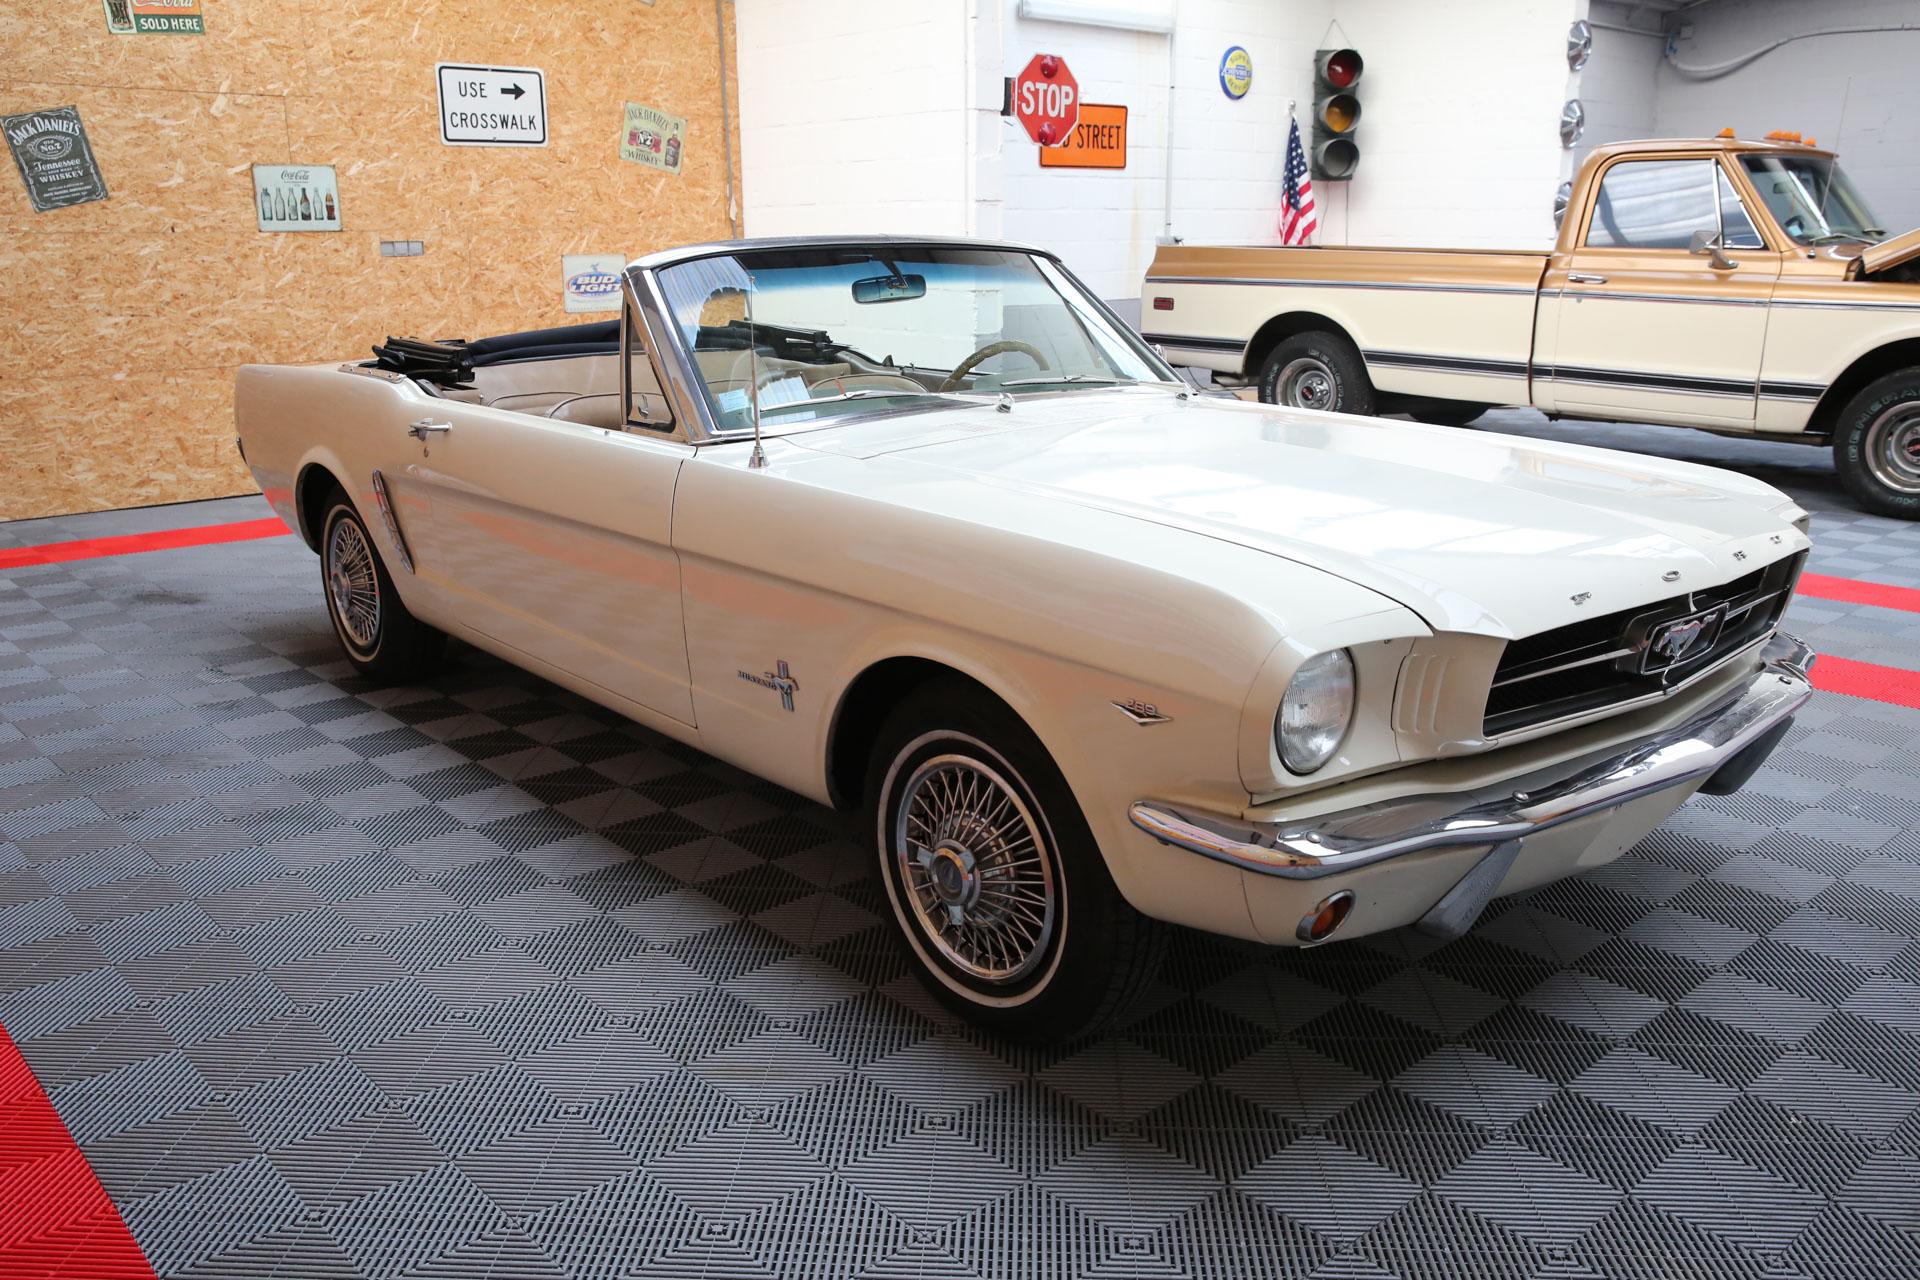 Superbe ford f100 pick up de 1965 a voir dans notre shop - show room importation voiture ancienne direct usa en france